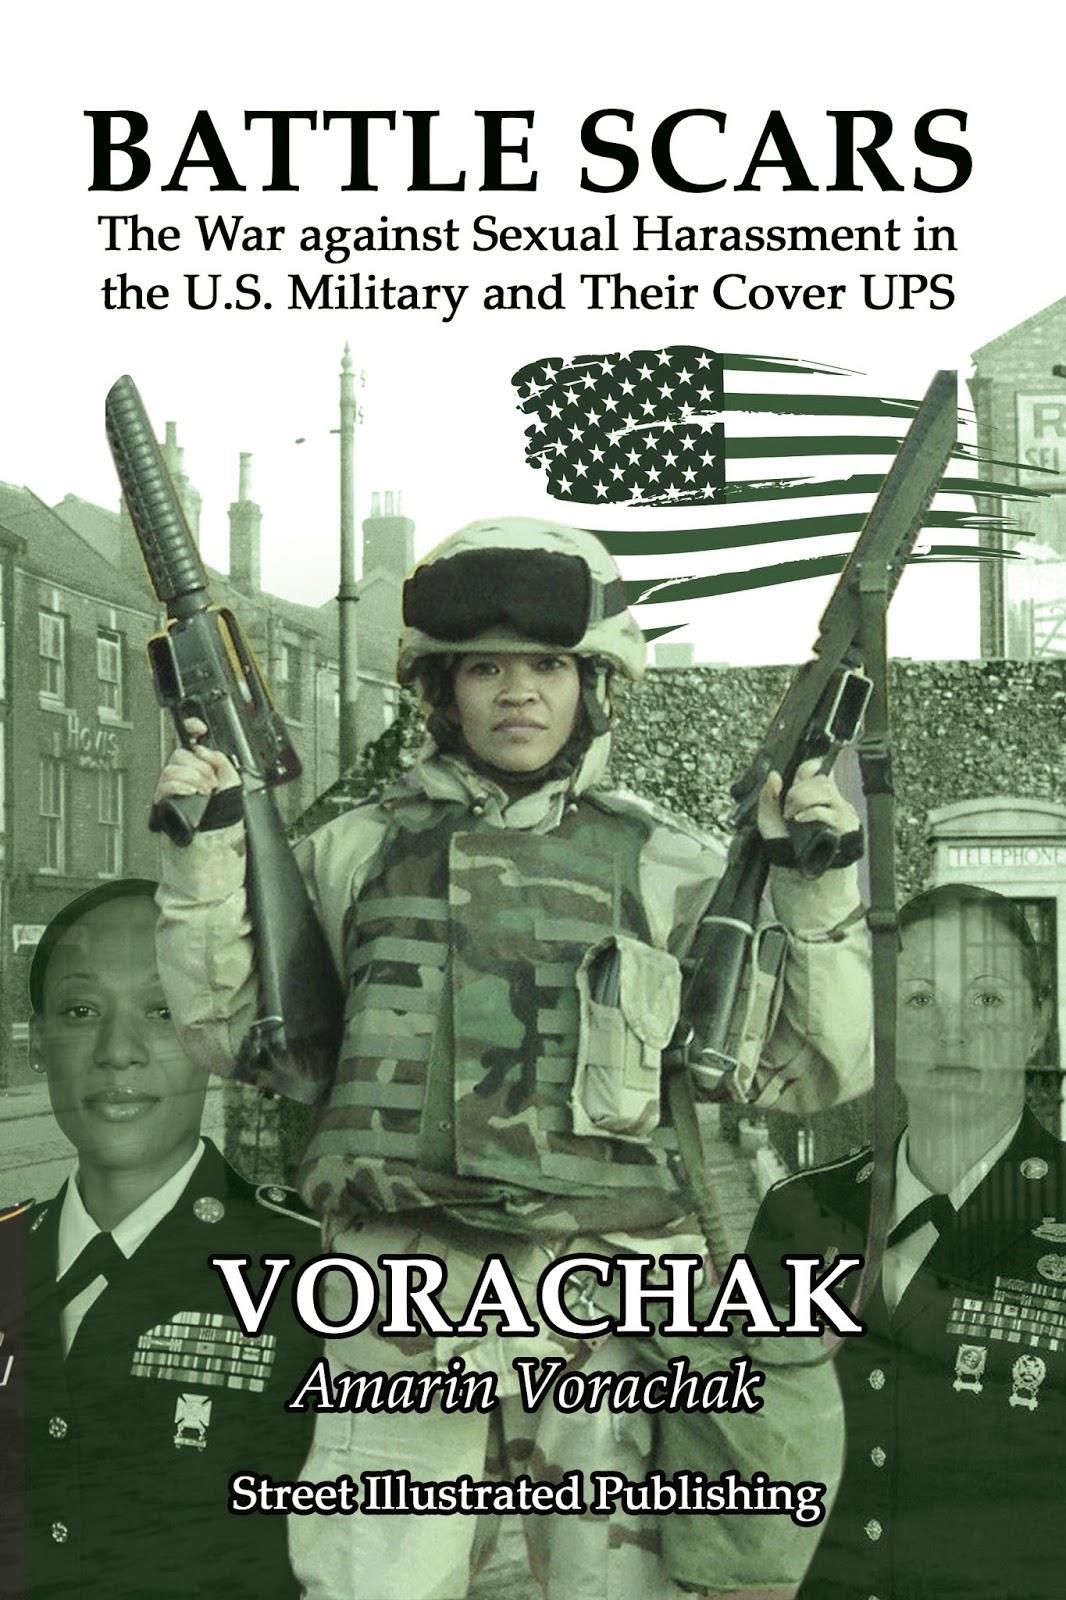 battle scars, battle scars book, us military rape crisis, us military harassment